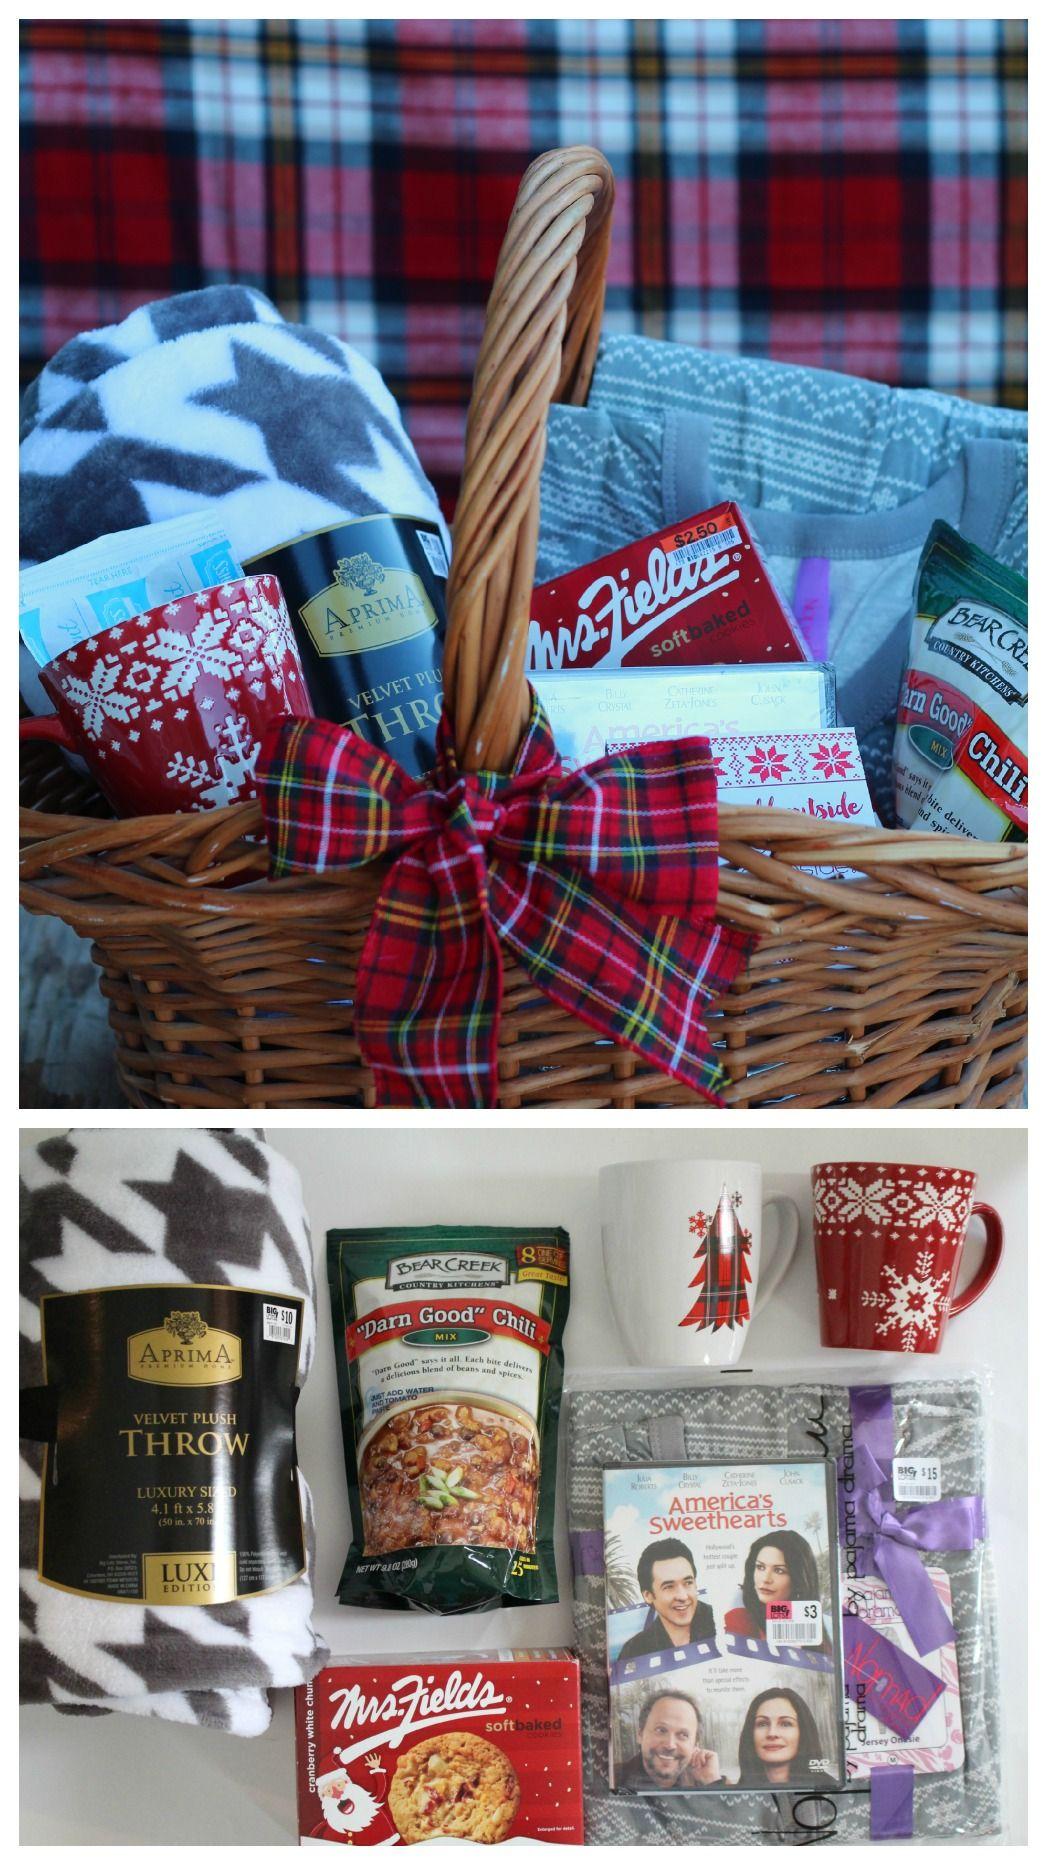 Themed gift basket roundup | Housewarming | Pinterest | Gifts, Gift ...